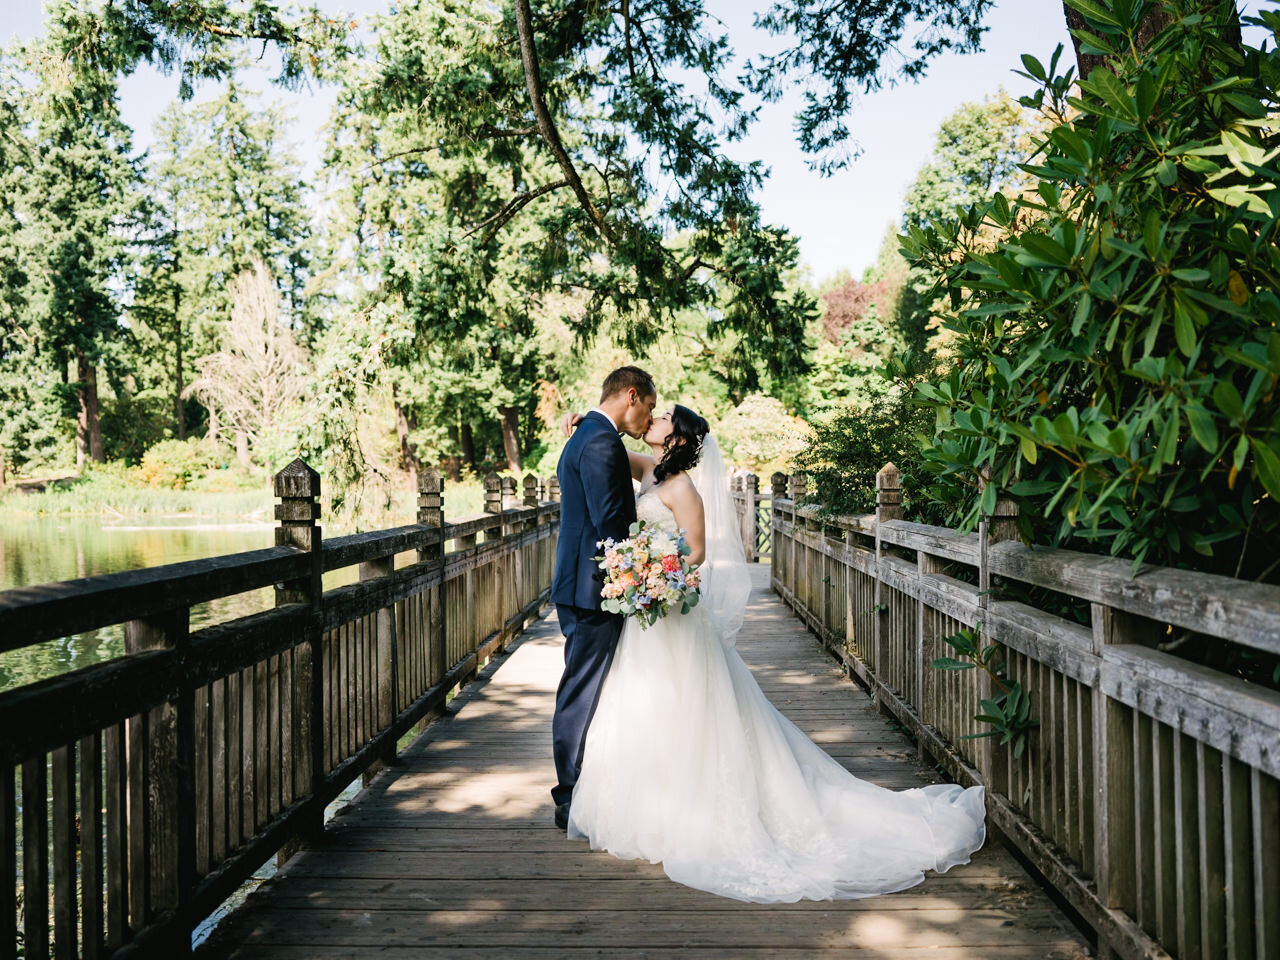 crystal-springs-rhododendron-garden-oregon-wedding-043.JPG